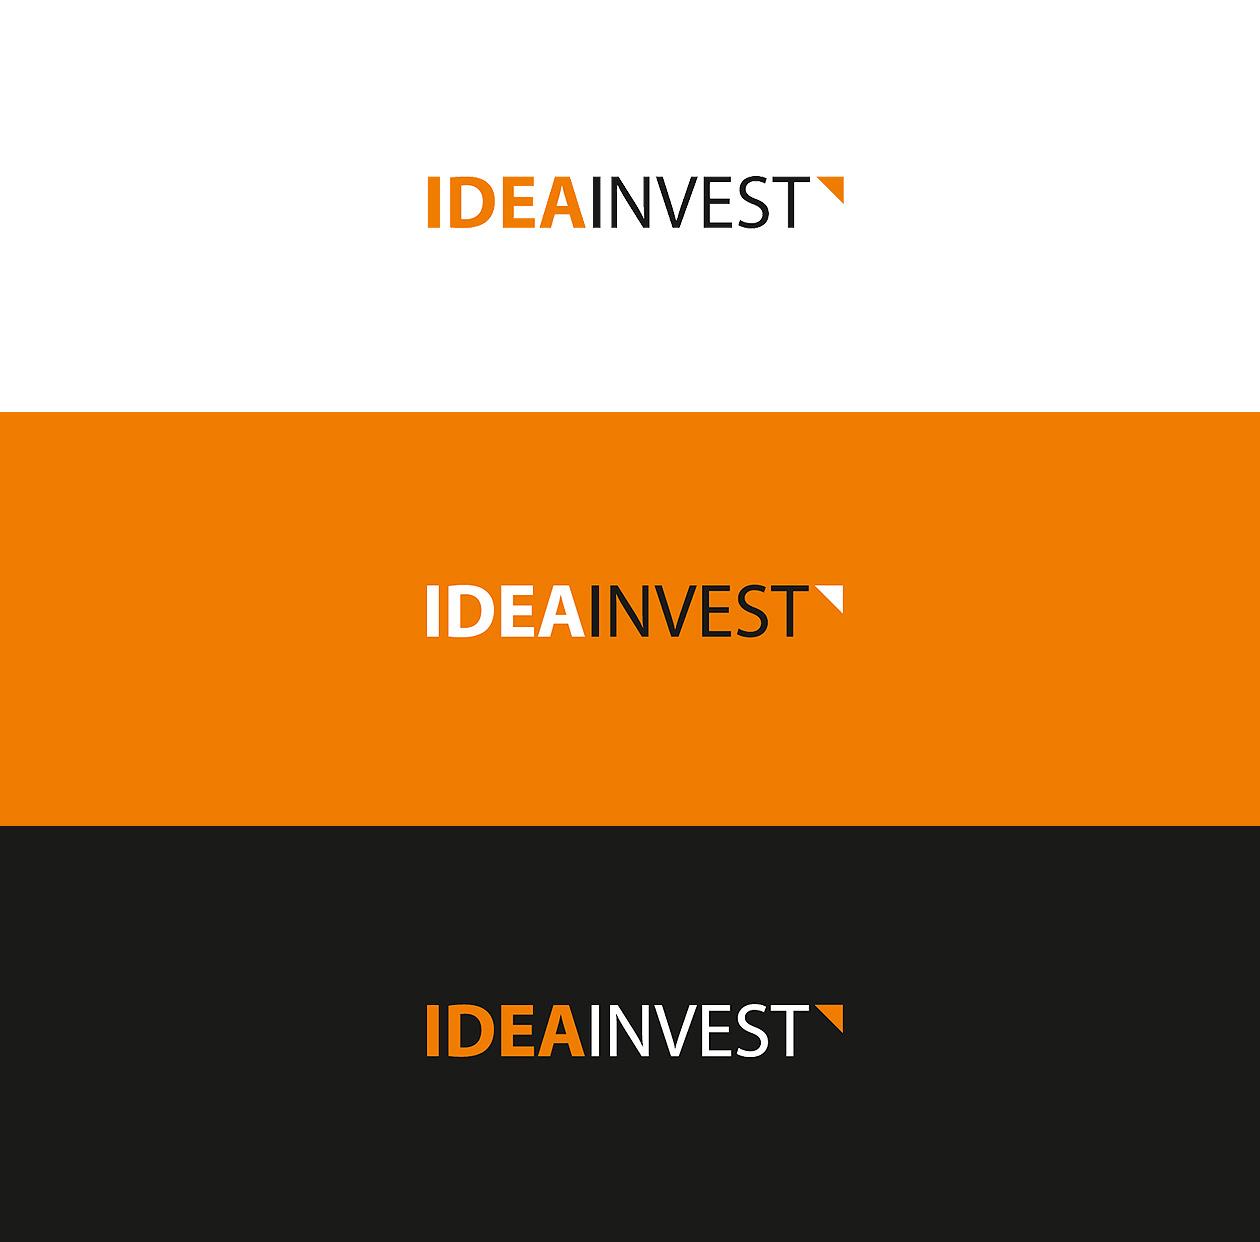 webdesign-logo-branding-idea-invest-06